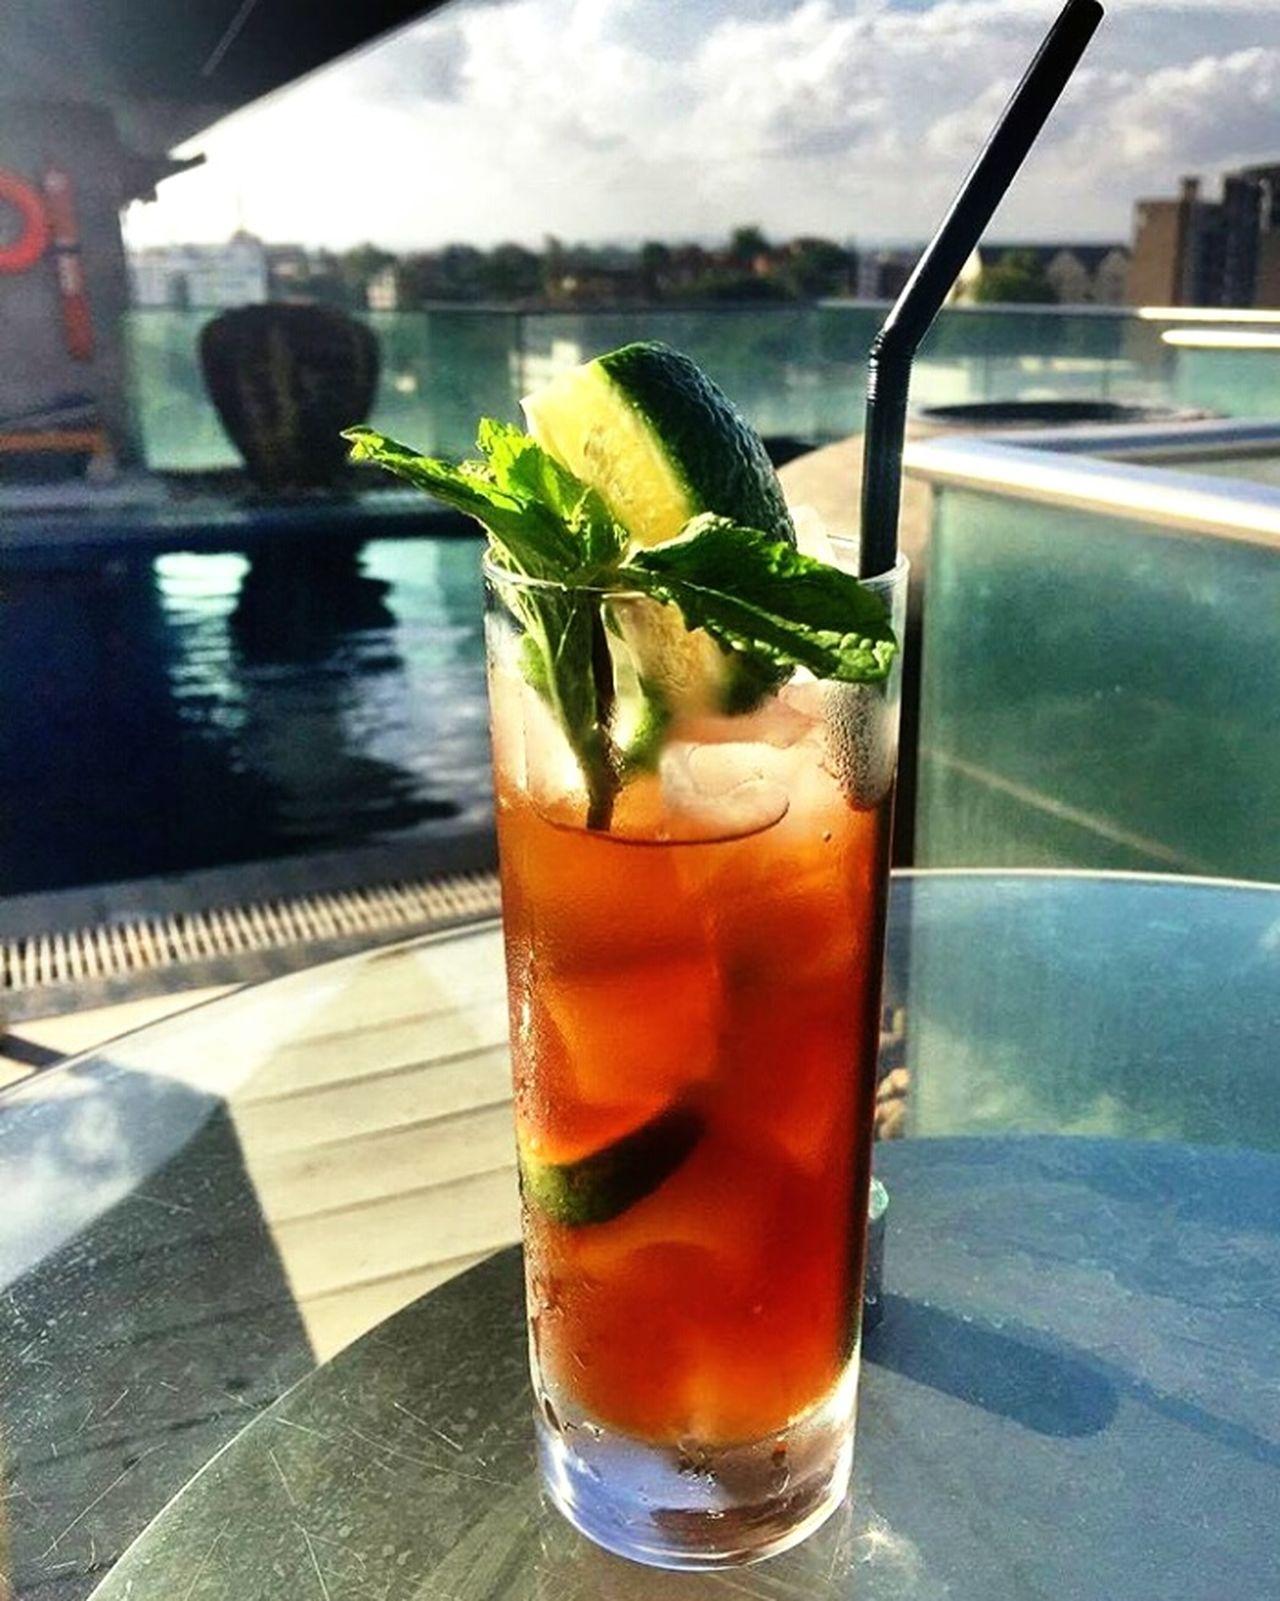 Sankara Kenya Nairobi Kenya Drinks Pool Pool Piscina Traveling Travel Photography